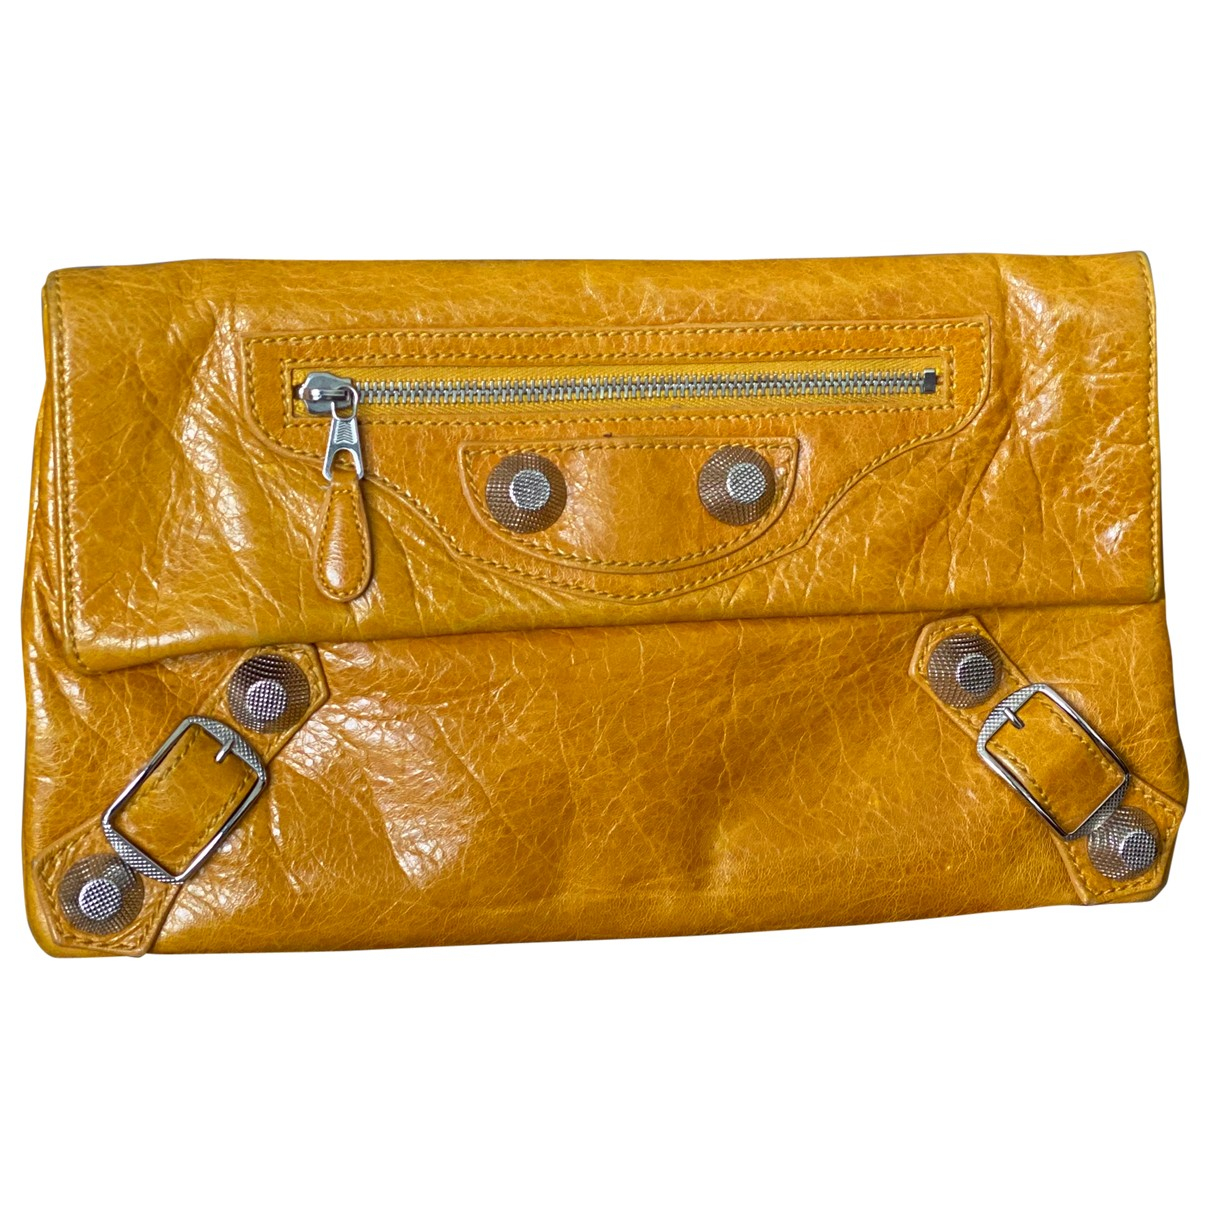 Balenciaga Envelop Leather Clutch bag for Women N